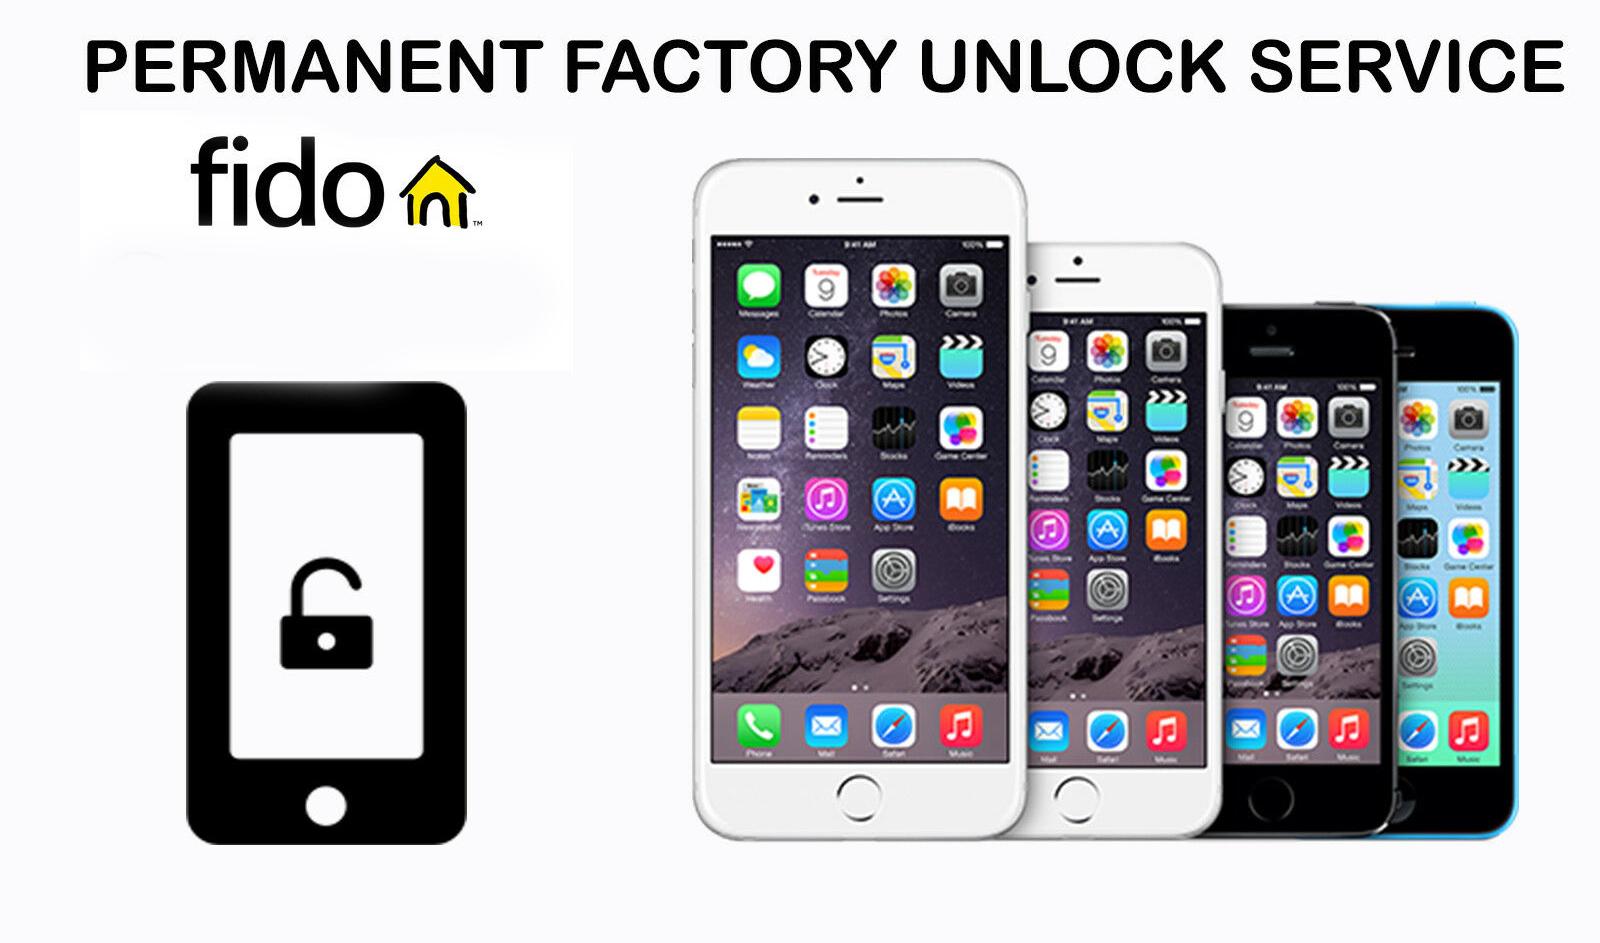 Fido Unlock Service